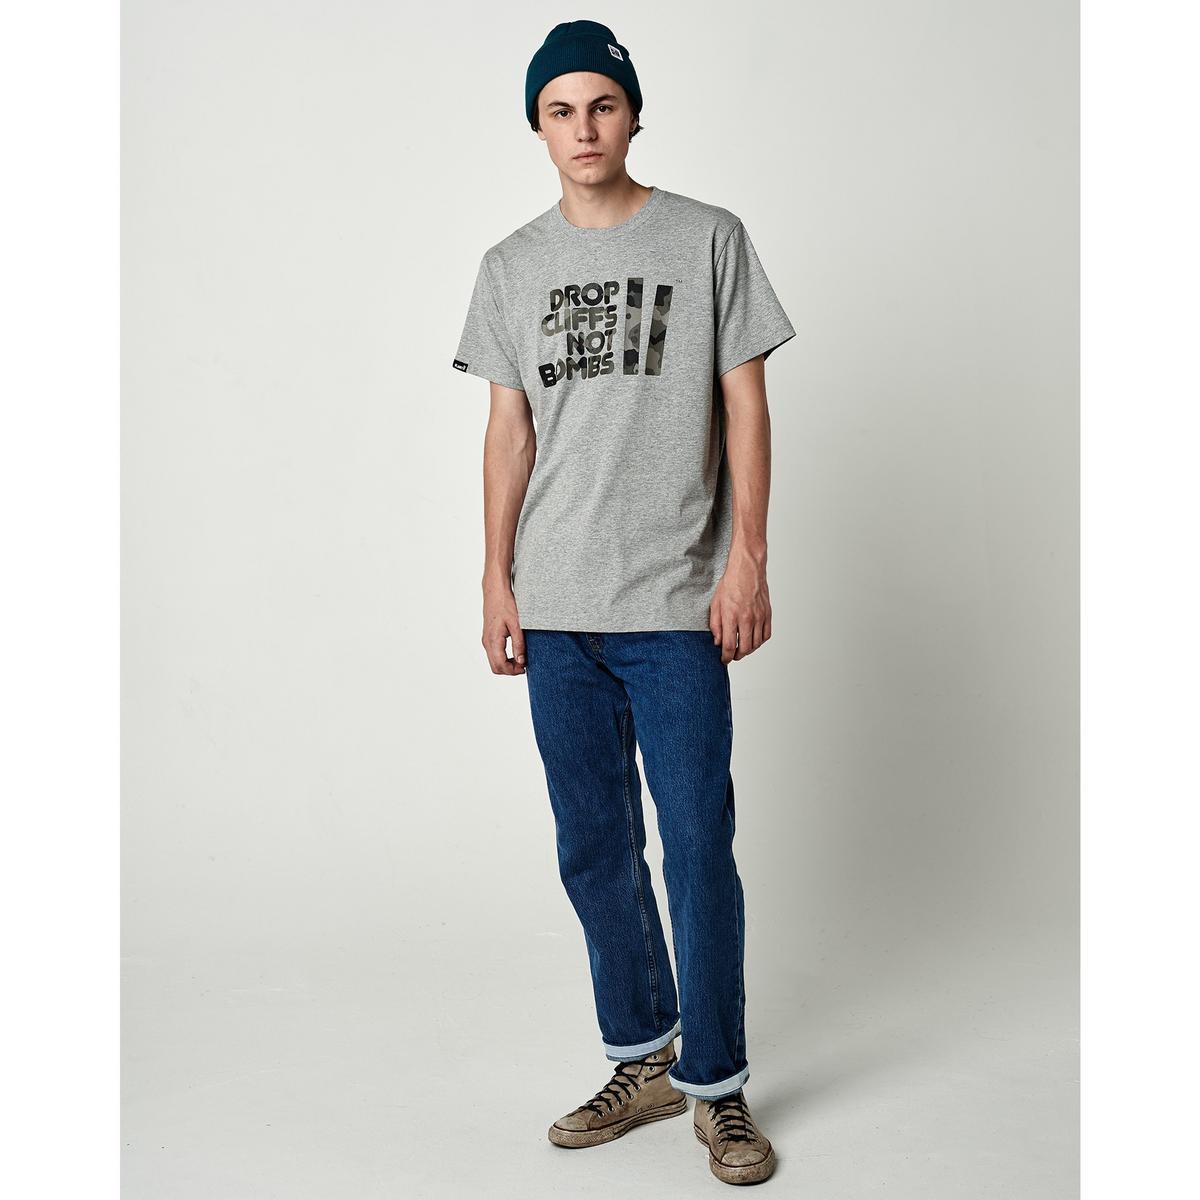 Planks Men's Drop Cliffs T-shirt - Grey